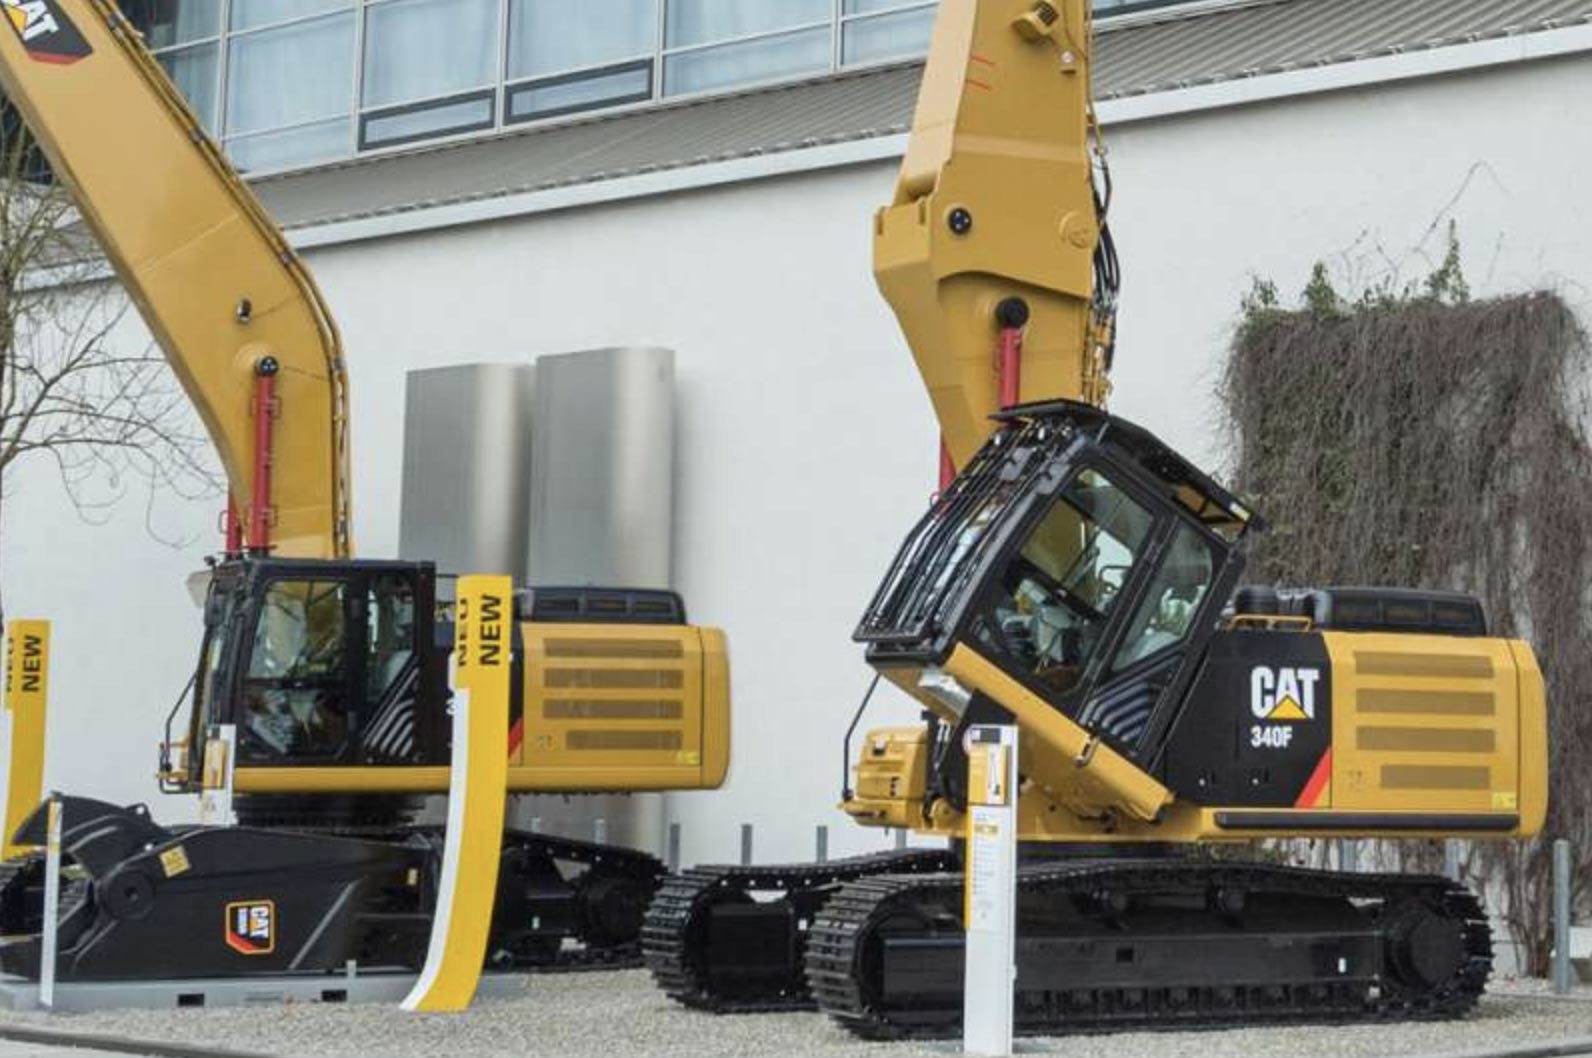 THE new Cat 340F UHD (ultra high demolition) hydraulic excavator